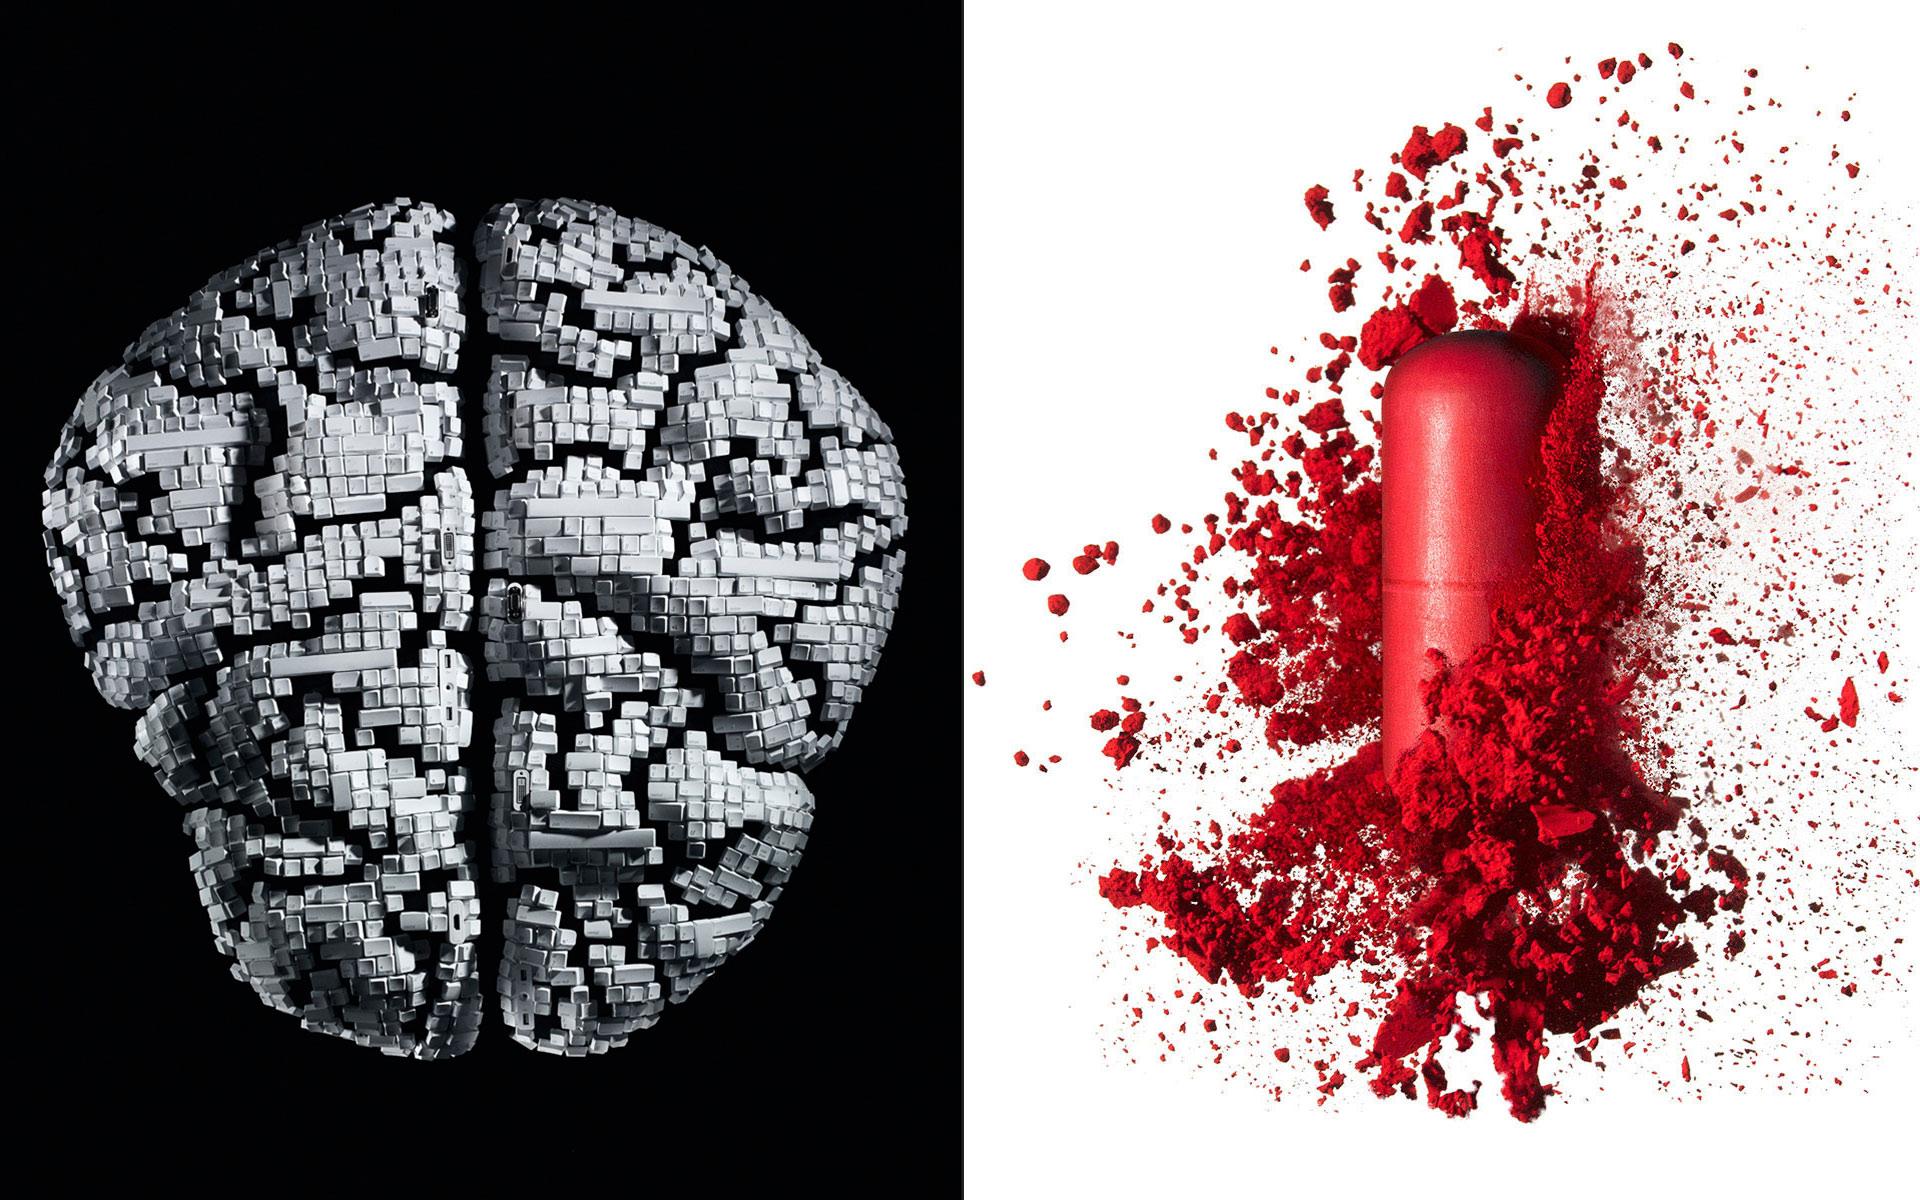 OV_brain-redpill_sq.jpg